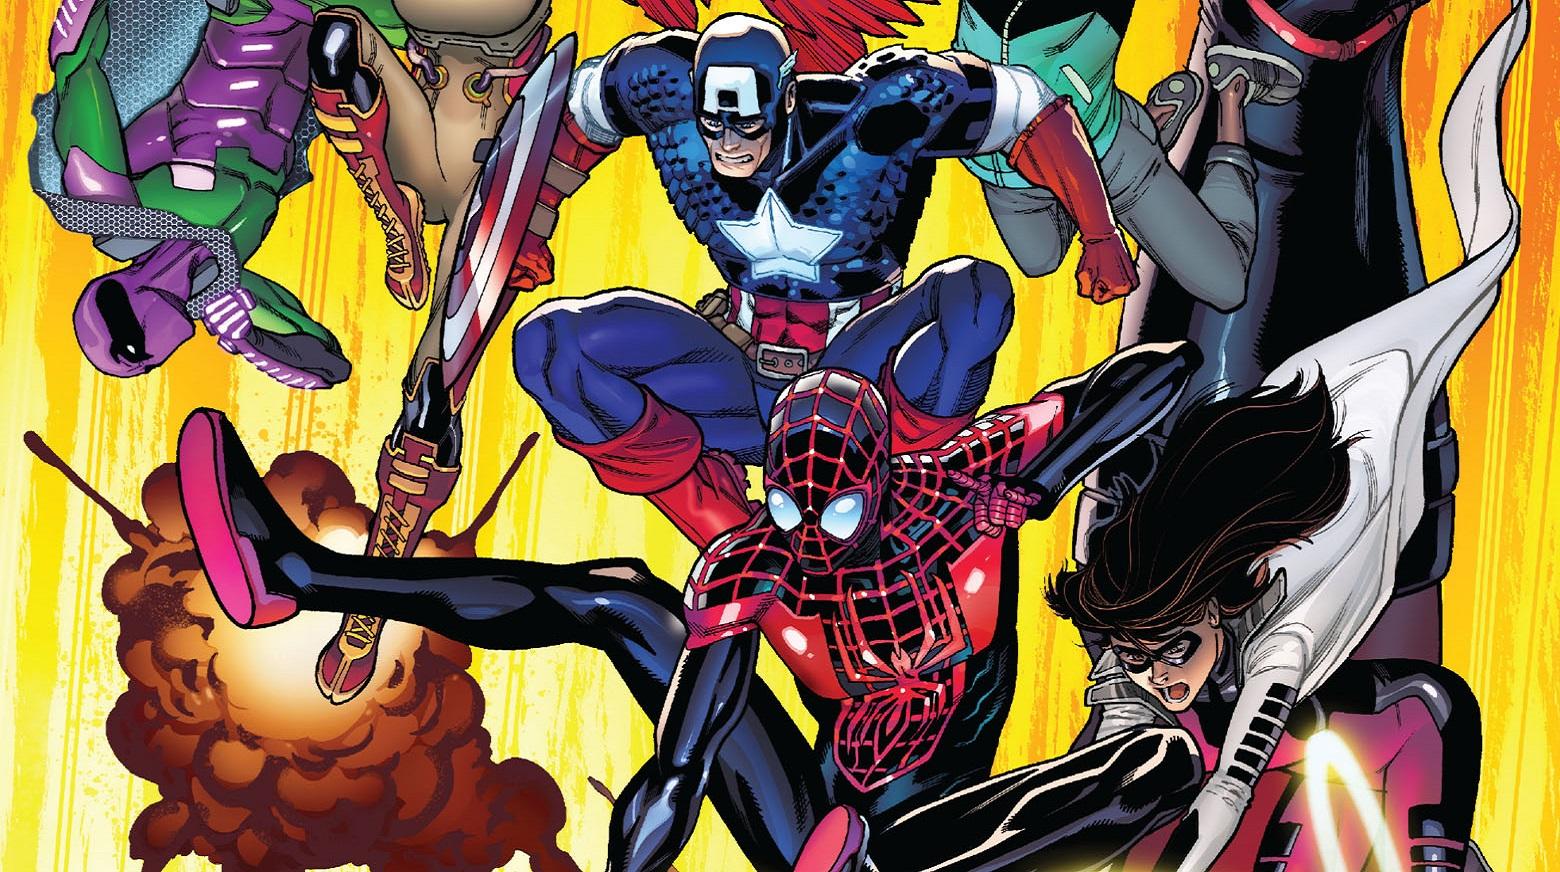 'Miles Morales: Spider-Man' #21